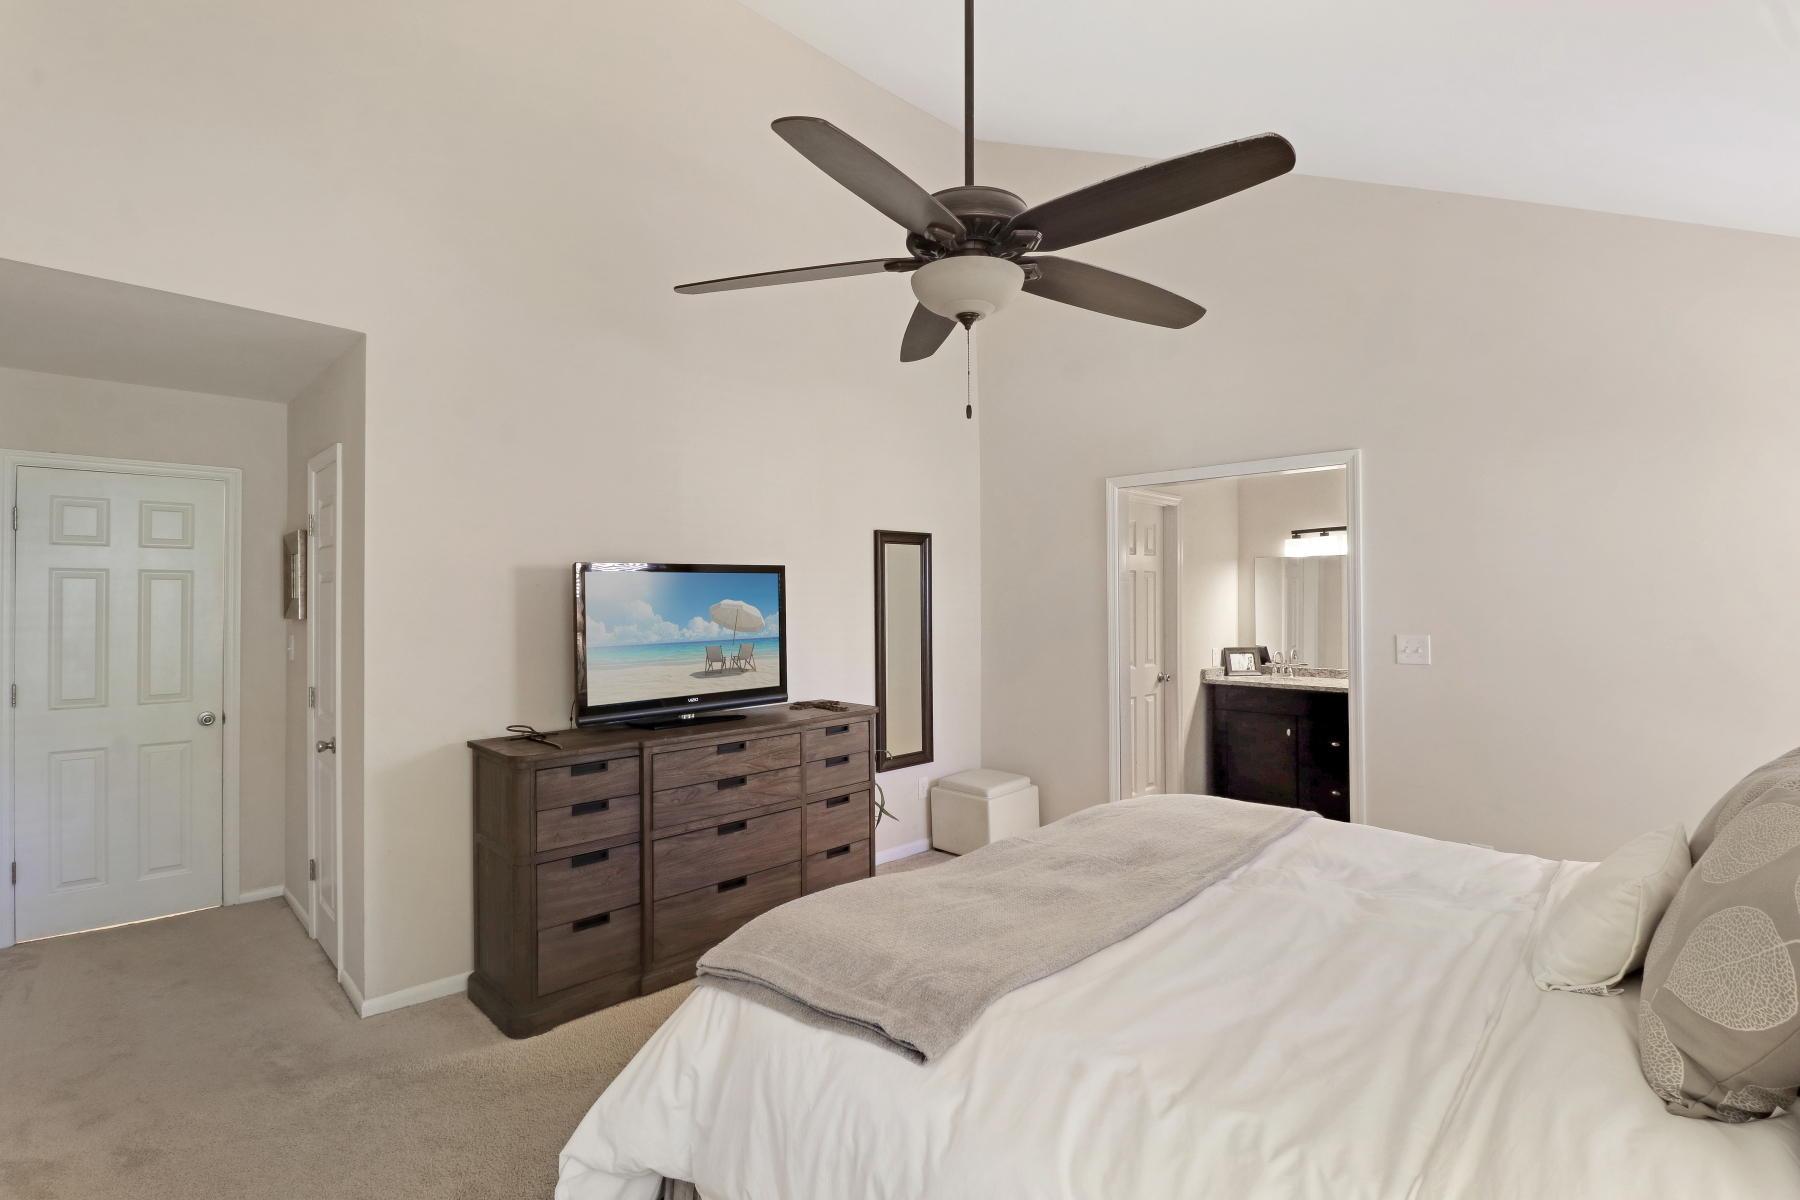 Harrison Acres Homes For Sale - 51 Markfield, Charleston, SC - 13